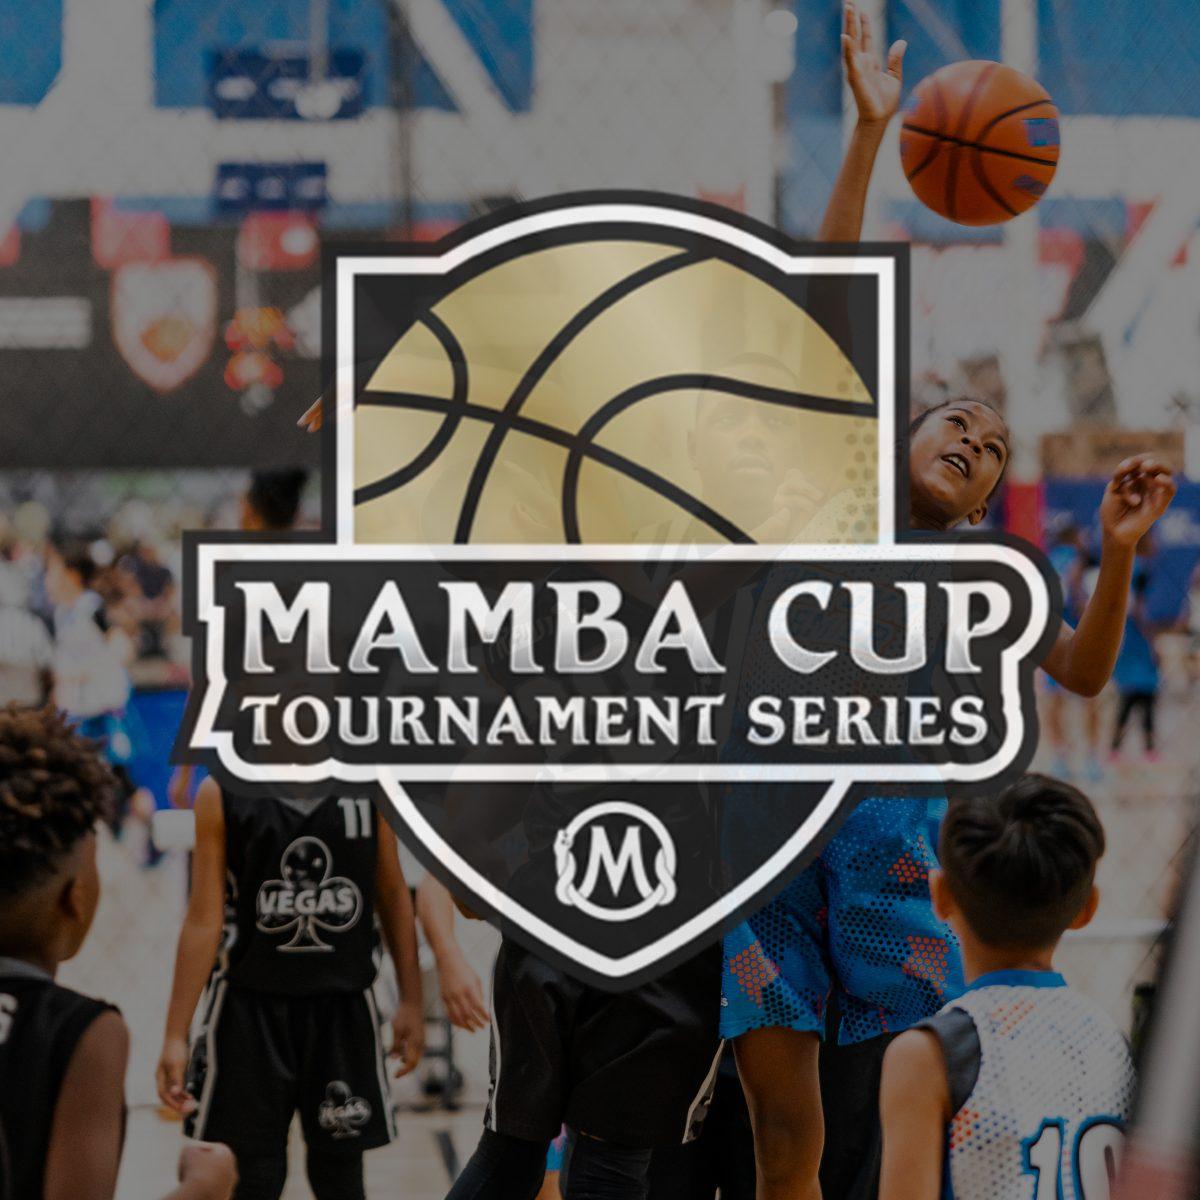 Mamba Cup